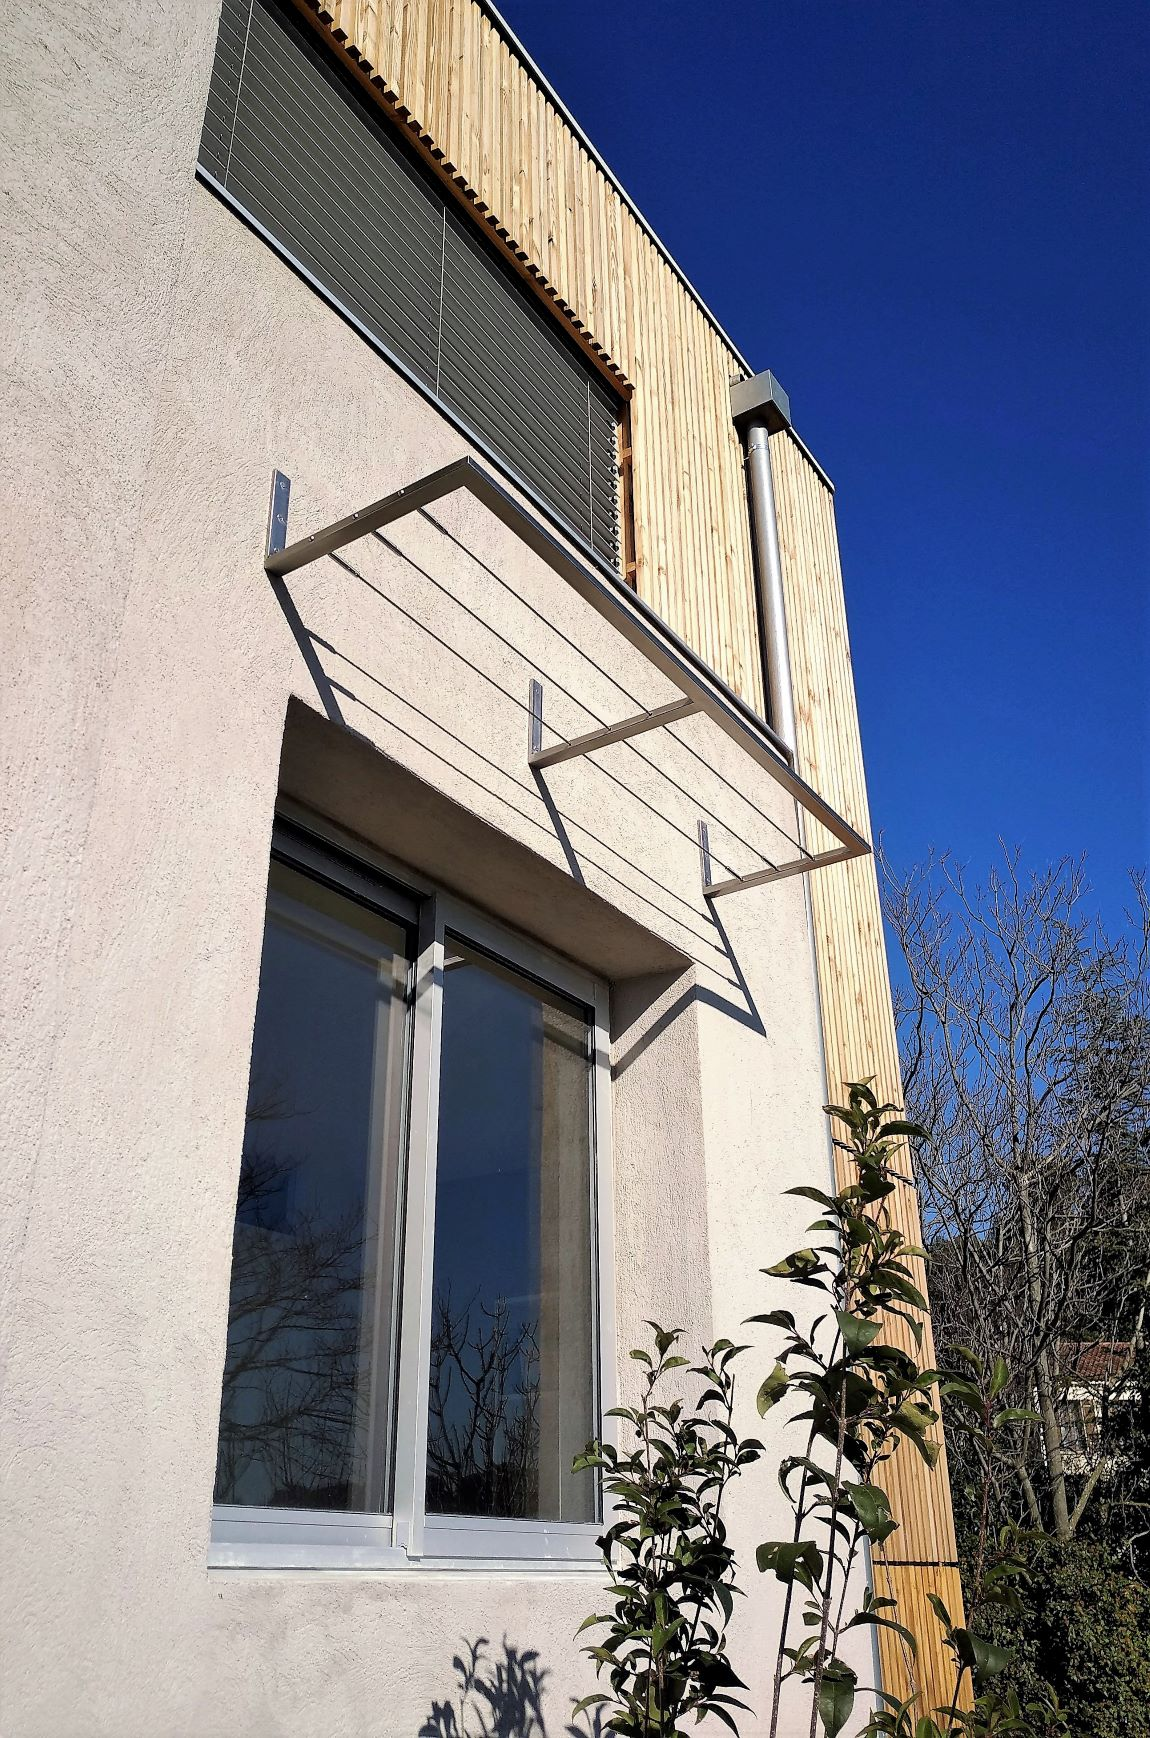 brise soleil inox 1R- Inoxngo ferronnier Marseille